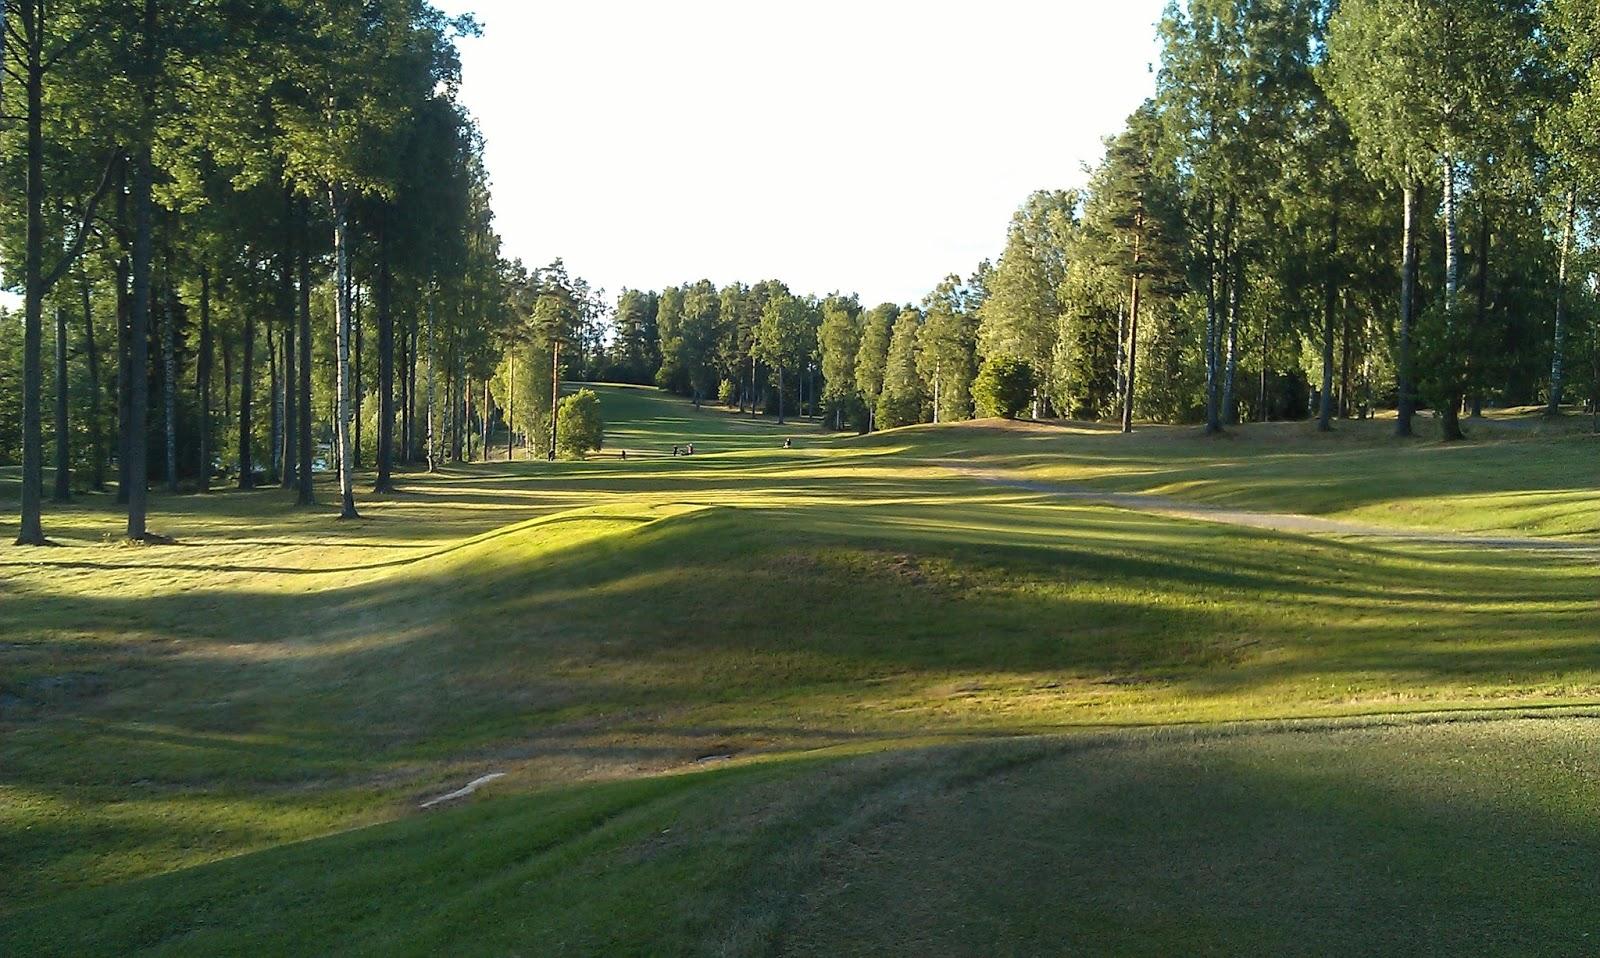 Ruuhikoski Golf, Nurmo Finland   Golfcourses I have played   Pinterest   Finland and Golf